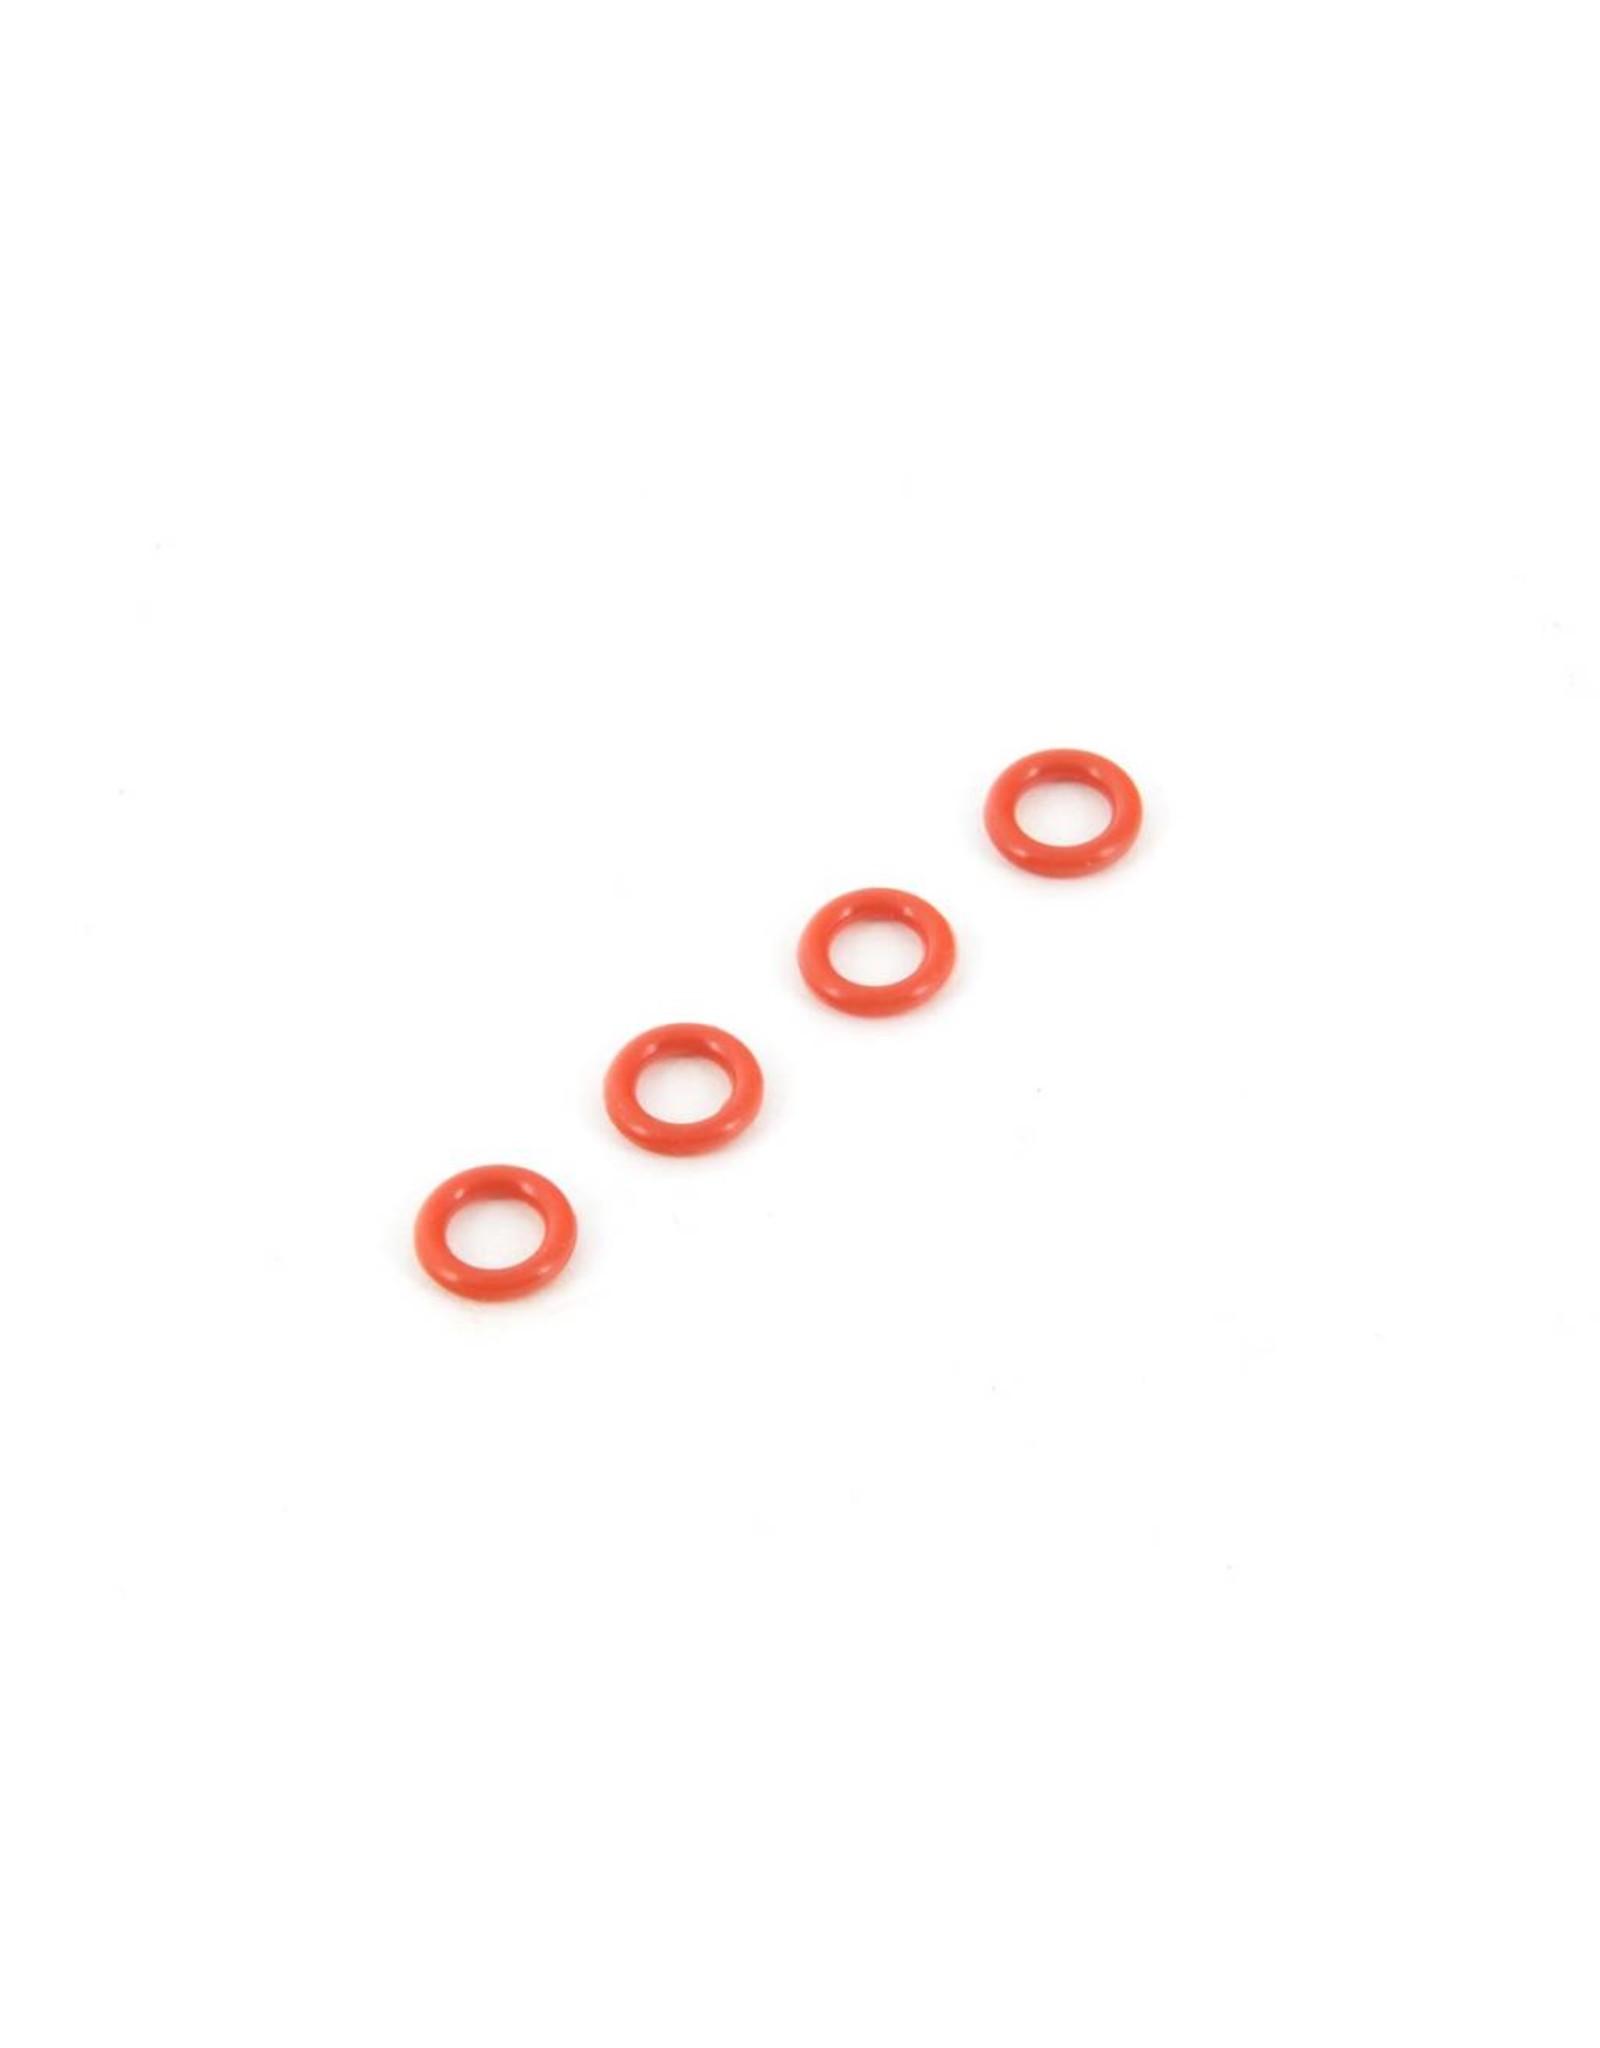 Arrma ARRMA O-Ring P-5 4.5x1.5mm Red (4)  (AR716011)